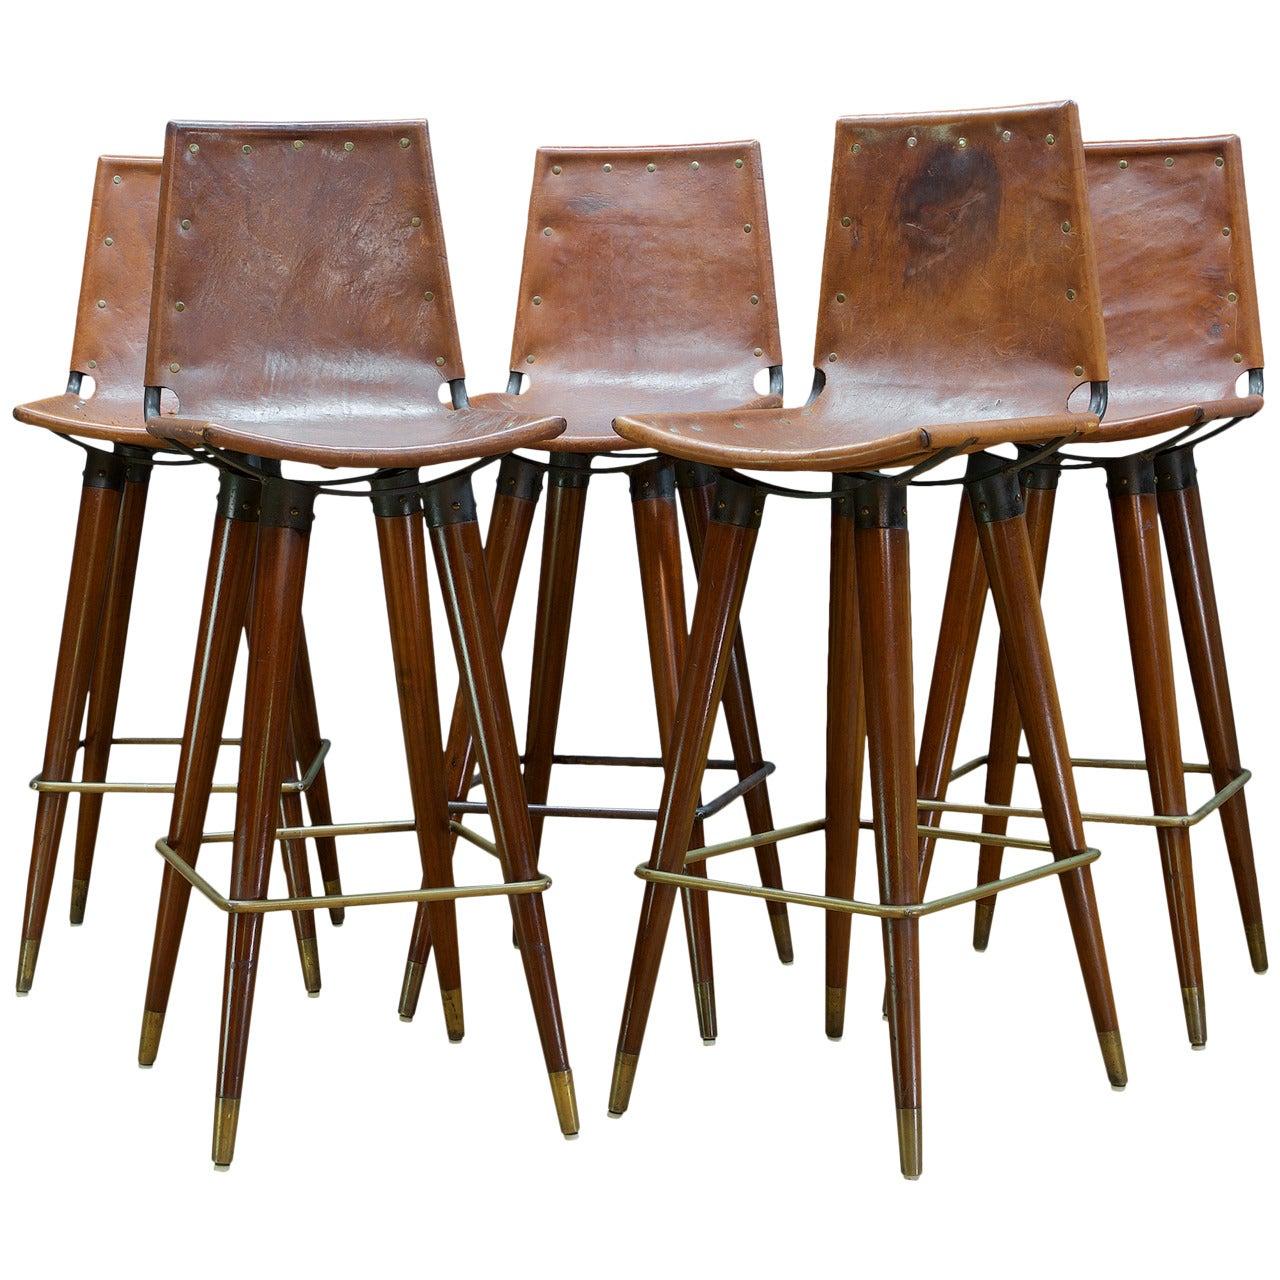 Remarkable 1960S Midcentury Leather Sling Iron Bar Stools At 1Stdibs Creativecarmelina Interior Chair Design Creativecarmelinacom